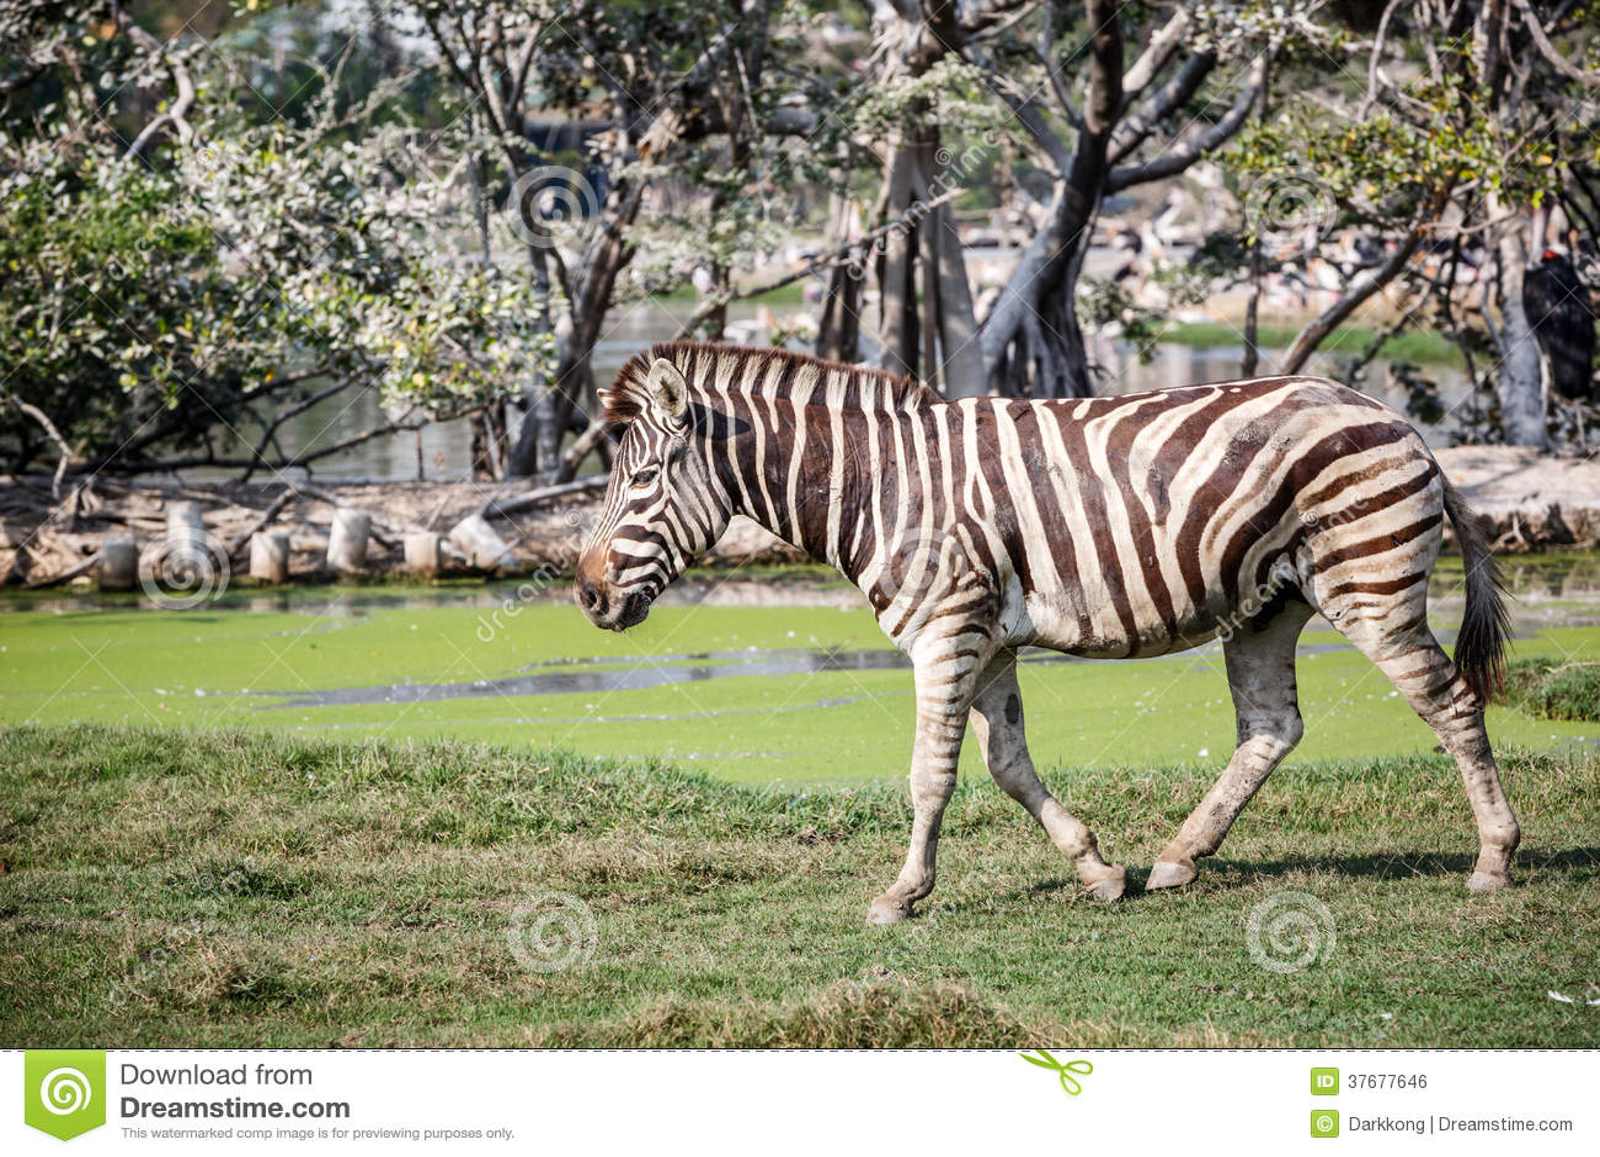 walking zebra royalty free stock image image 37677646